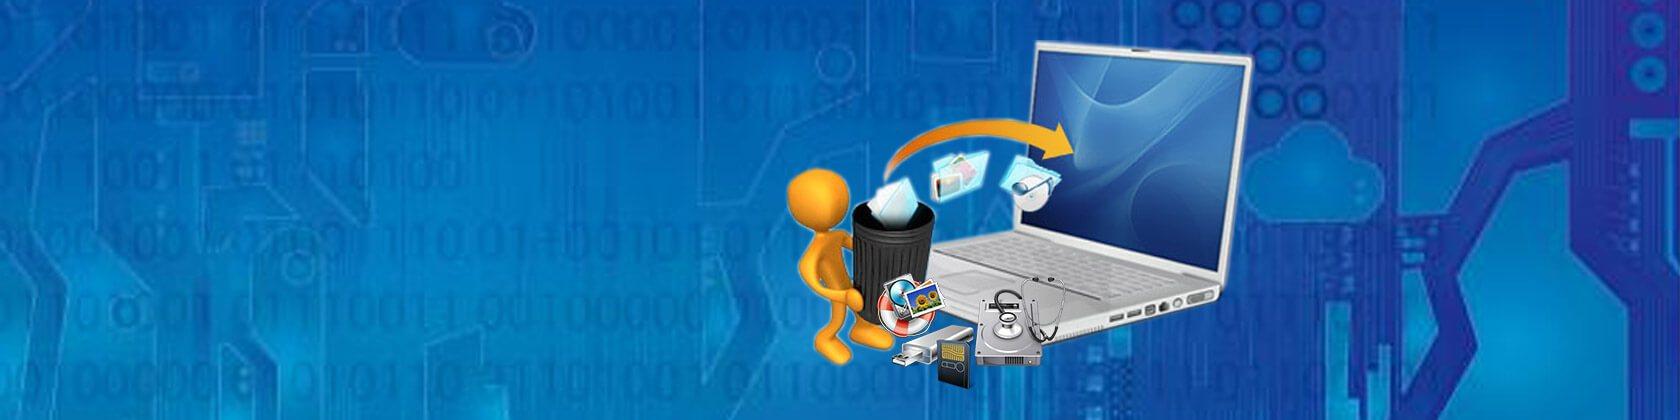 banner image - Asus Laptop Hard Disk Replacement